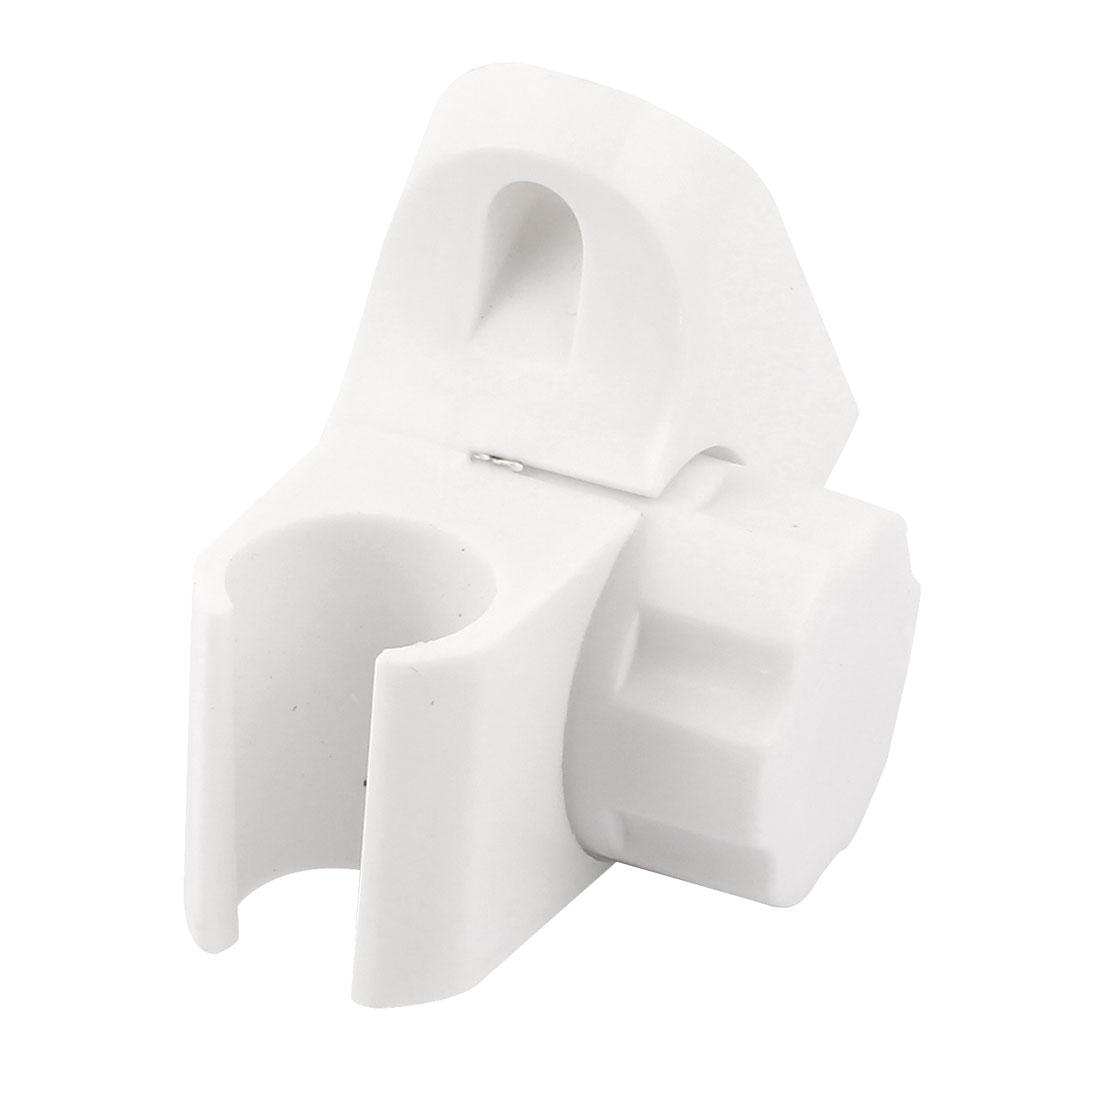 Bathroom Wall Mounted Adjustable Hose Shower Spray Head Bracket Holder White